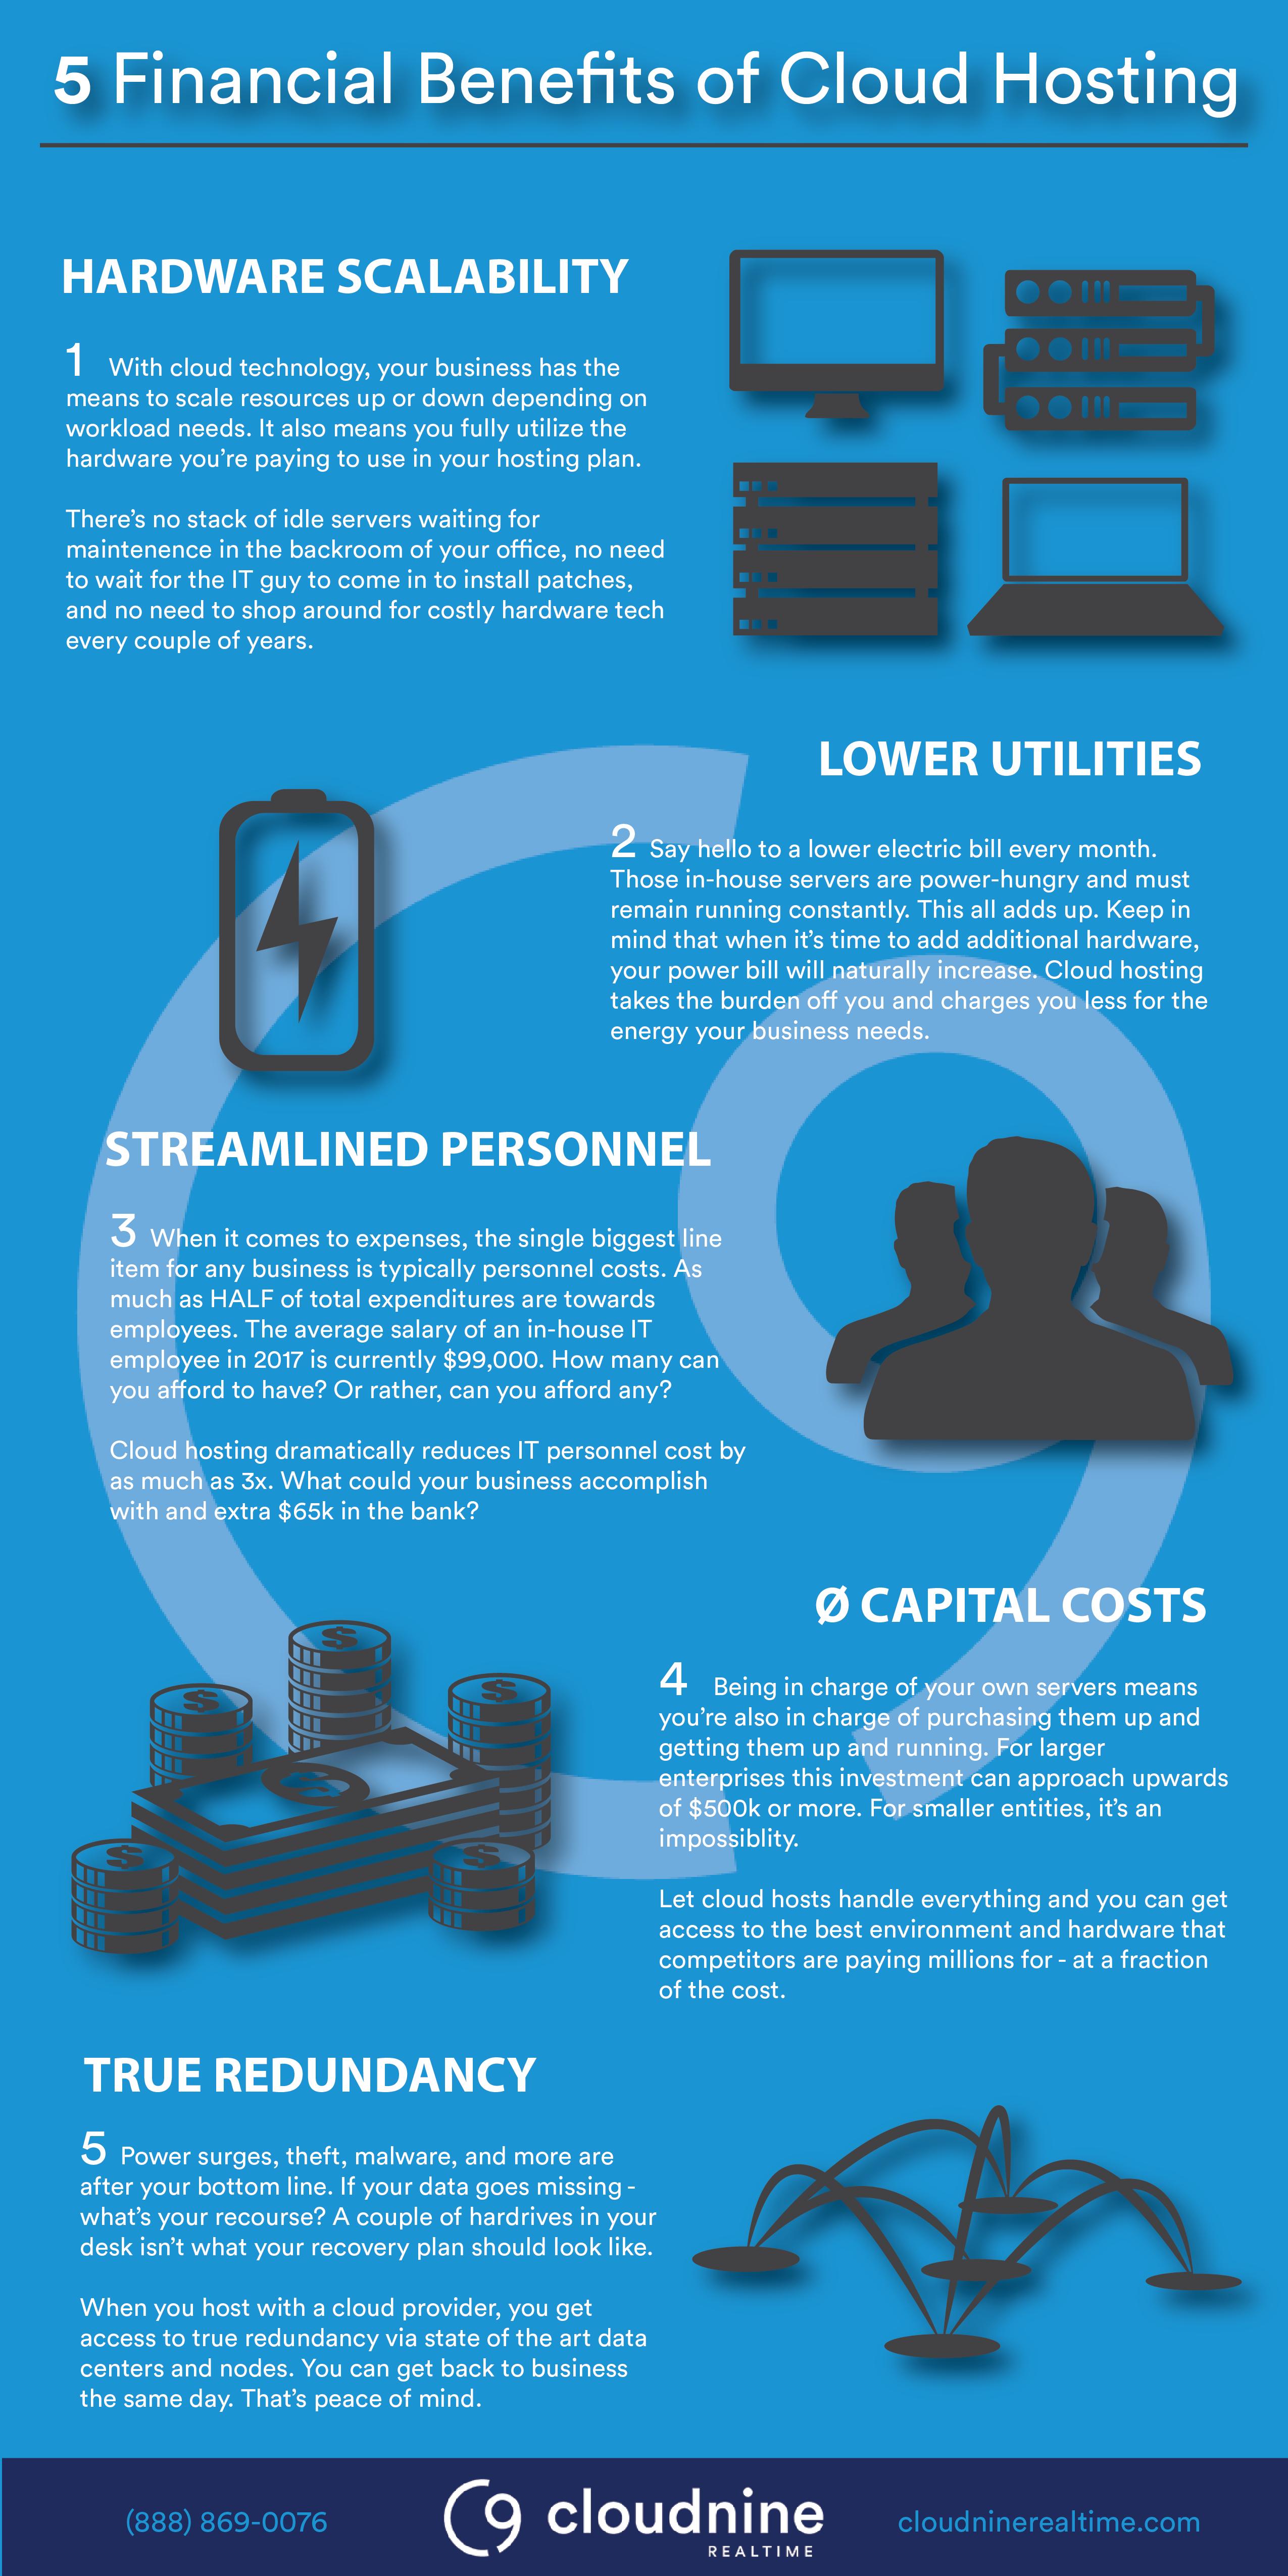 5 Financial Benefits of Cloud Hosting